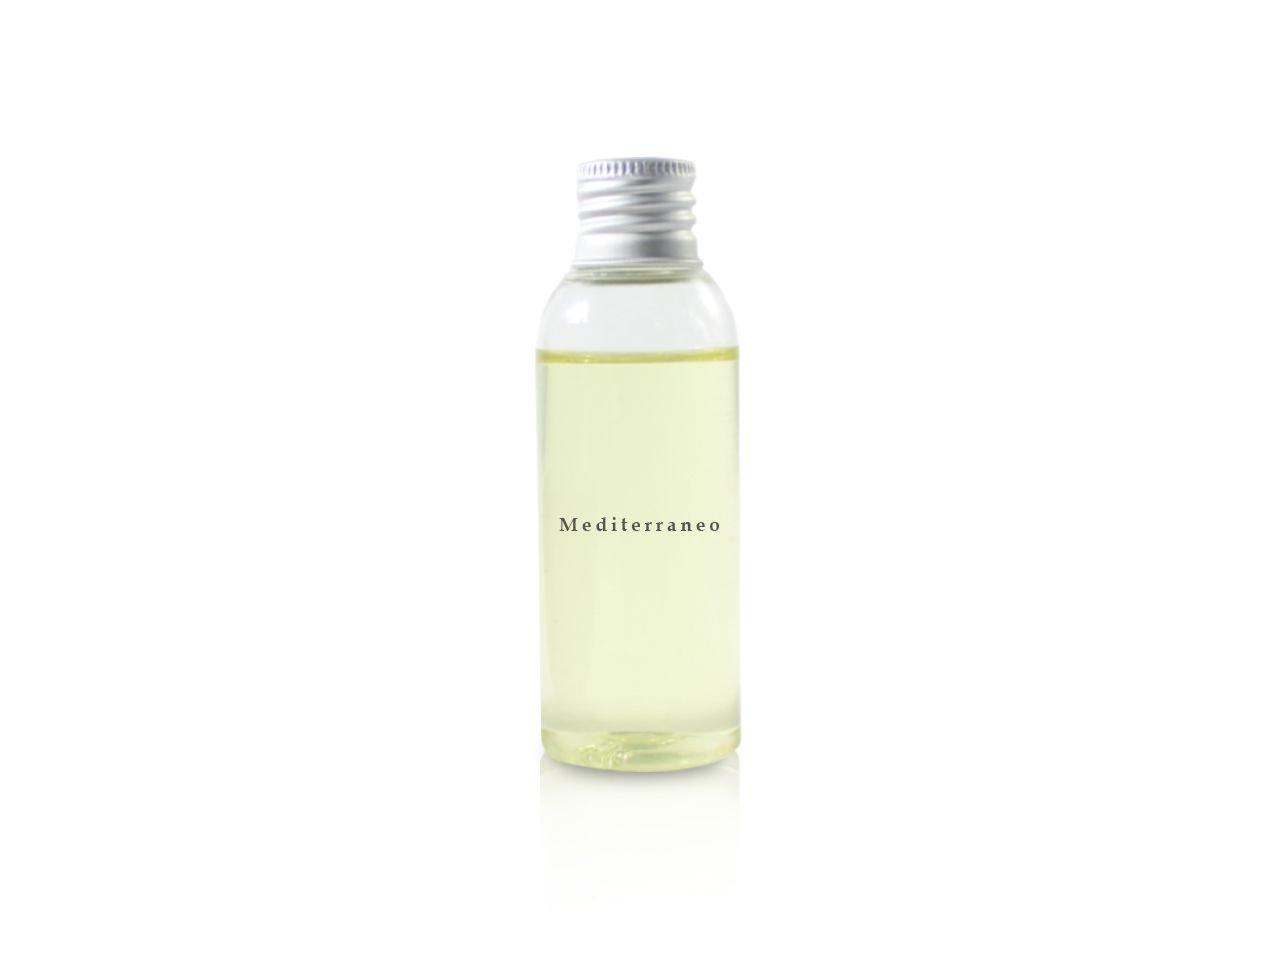 Ricarica Diffusore Ambiente Mediterraneo 50 ml - v1